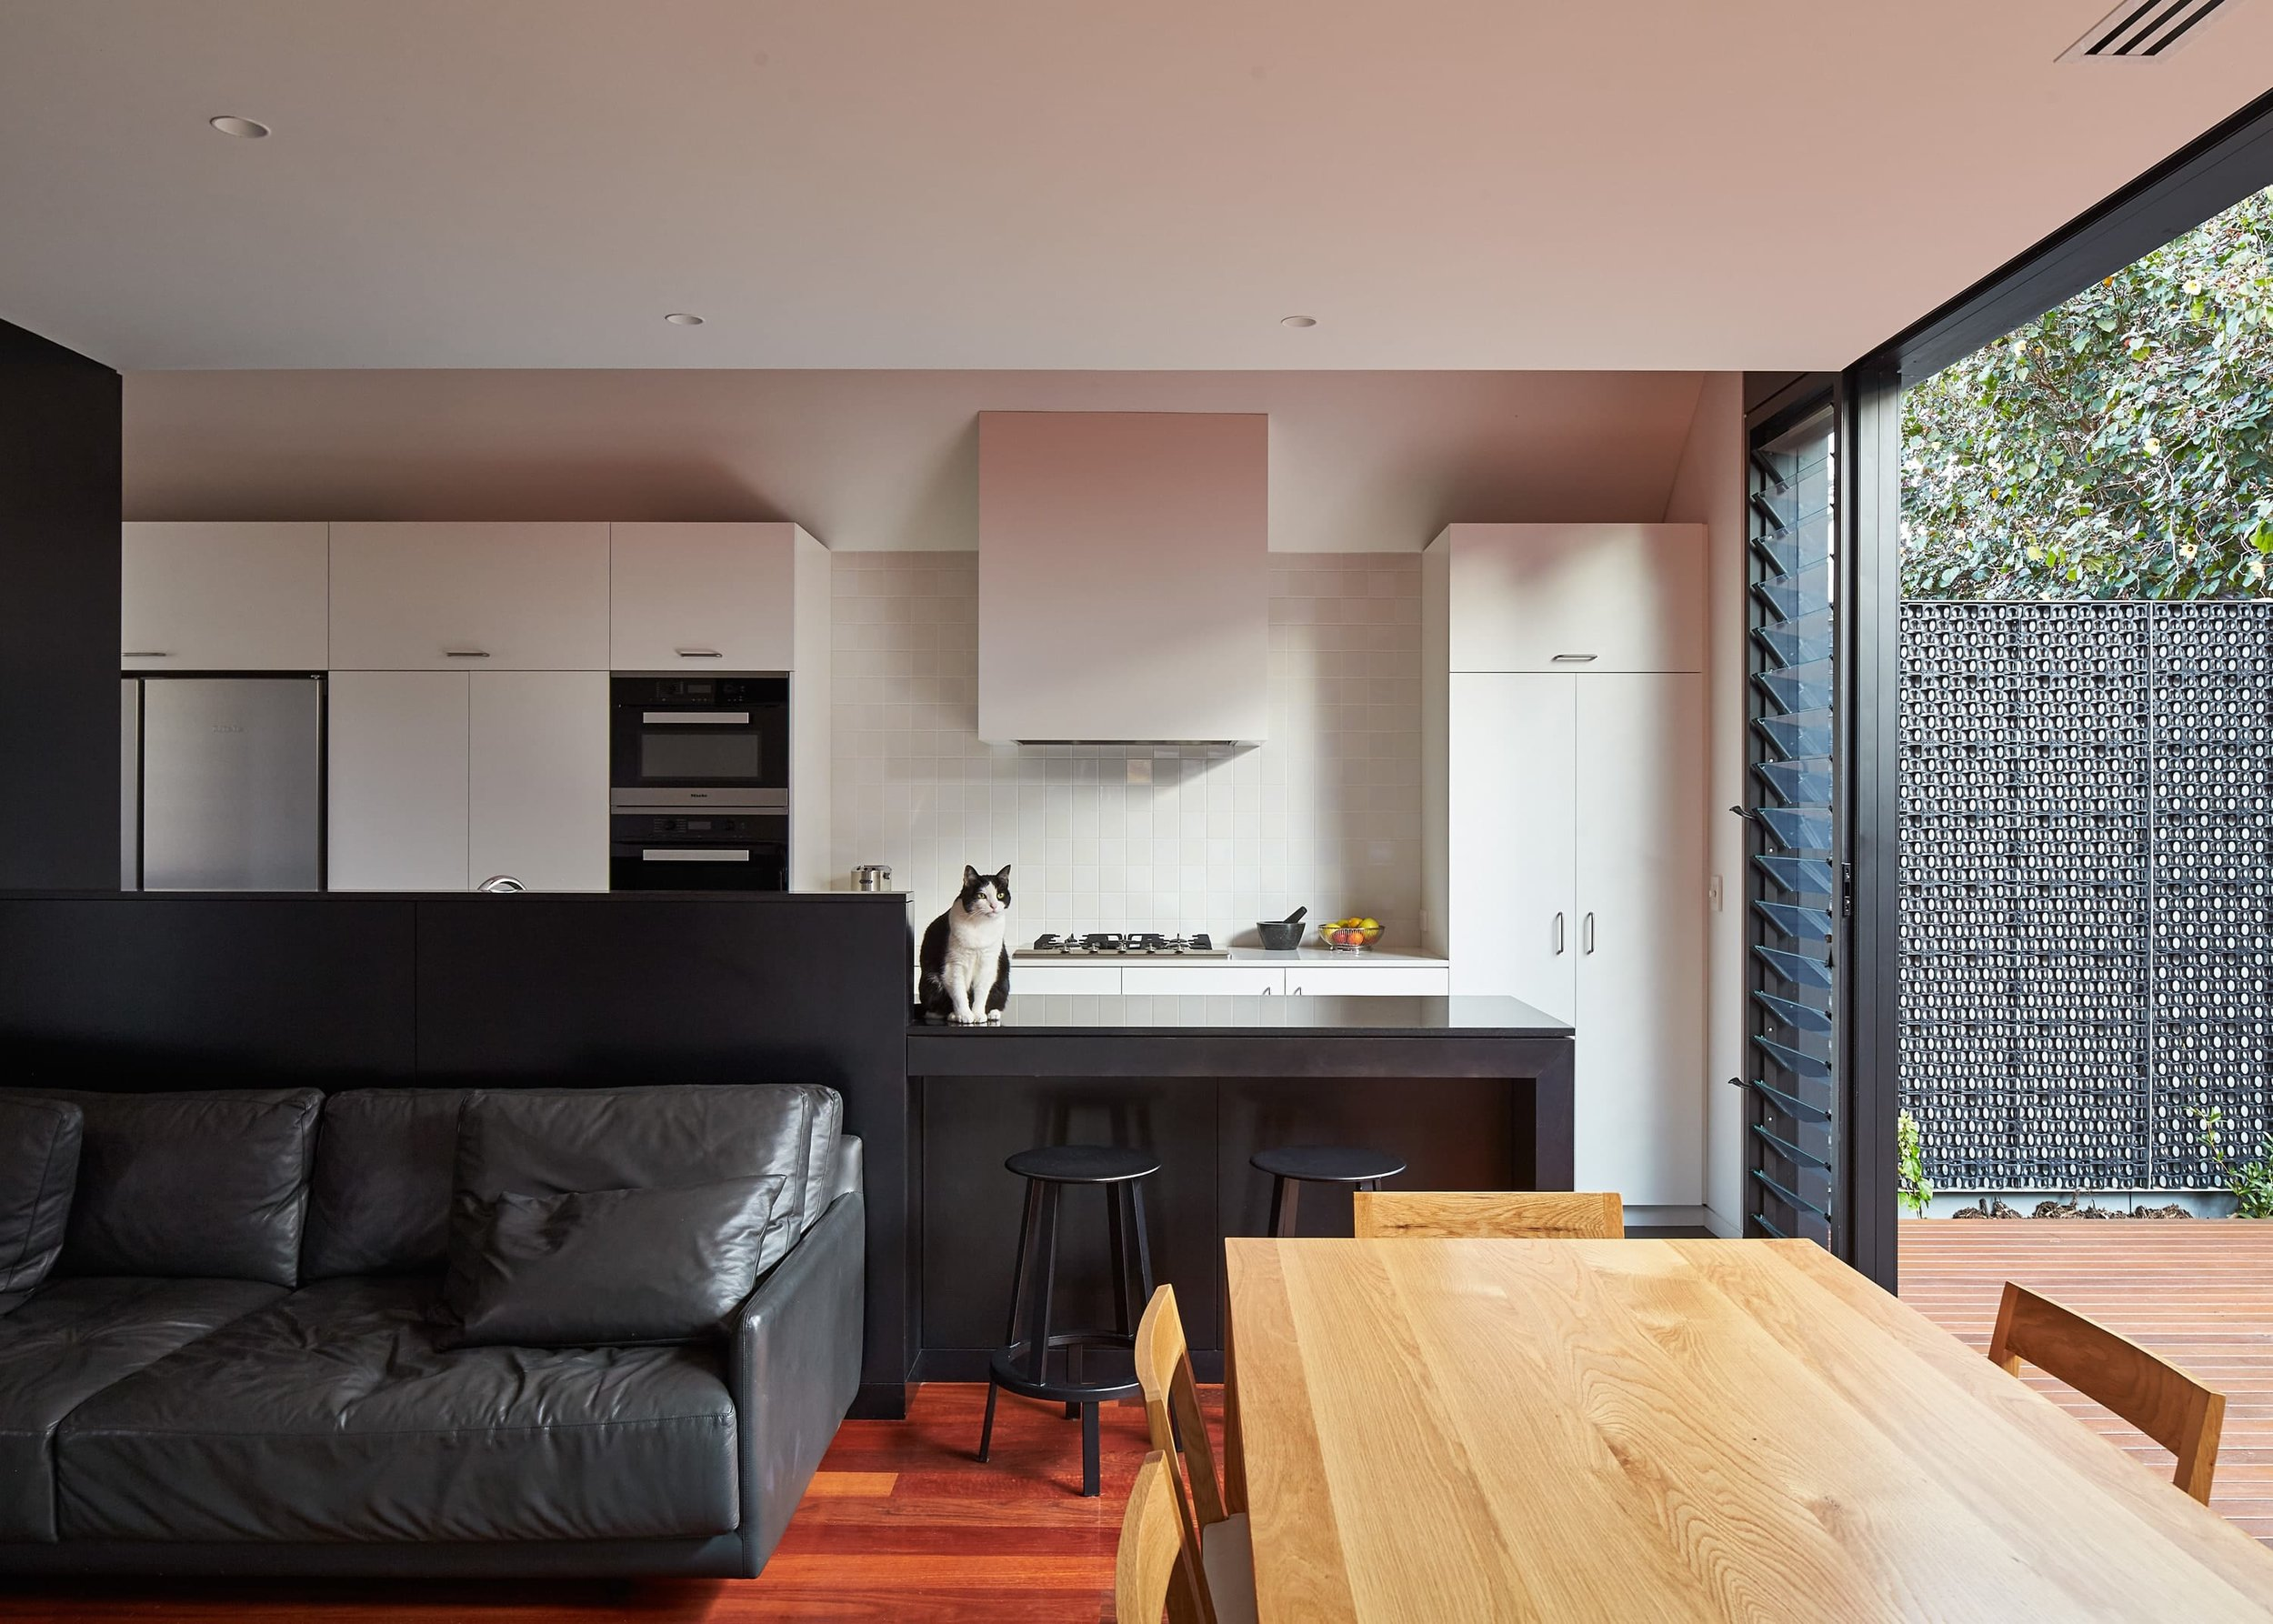 Bosske_Camino_House_Kitchen.jpg